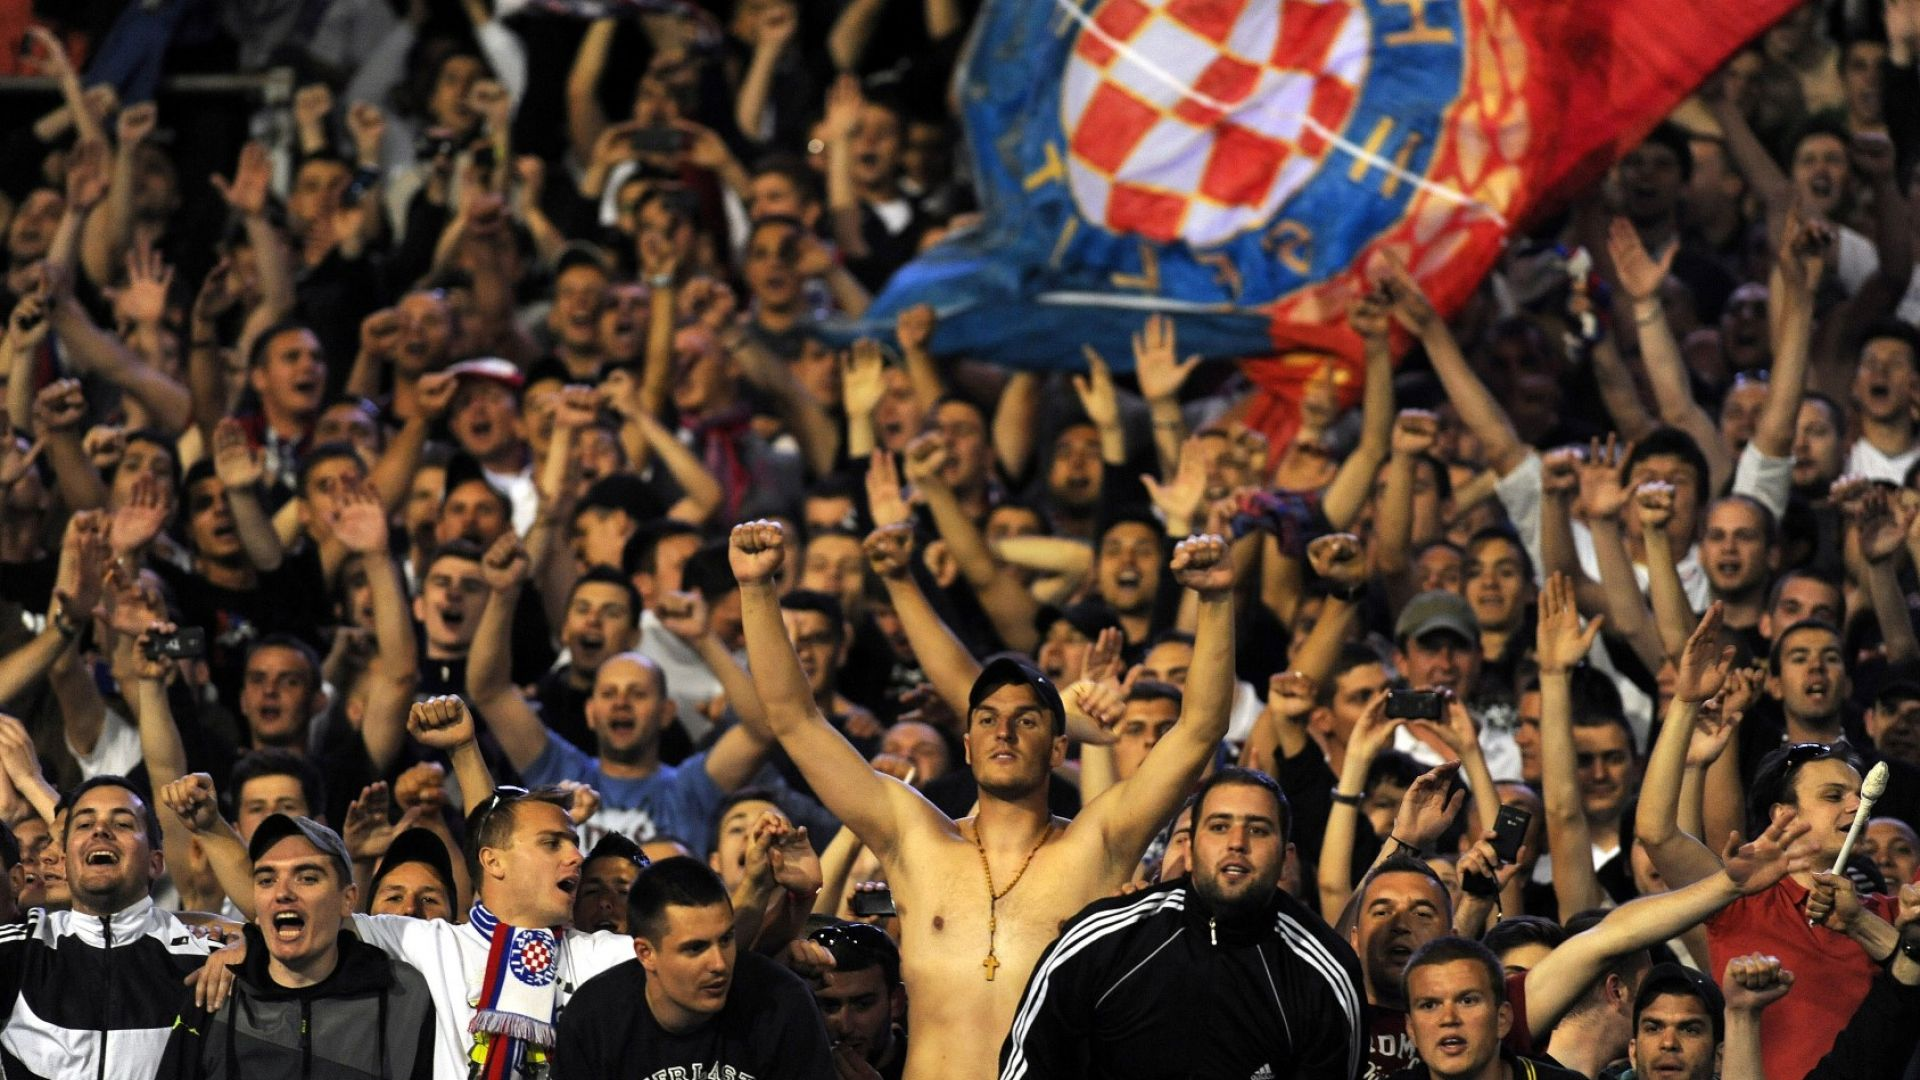 400 хървати пристигат в София, полиция и жандармения ги чакат